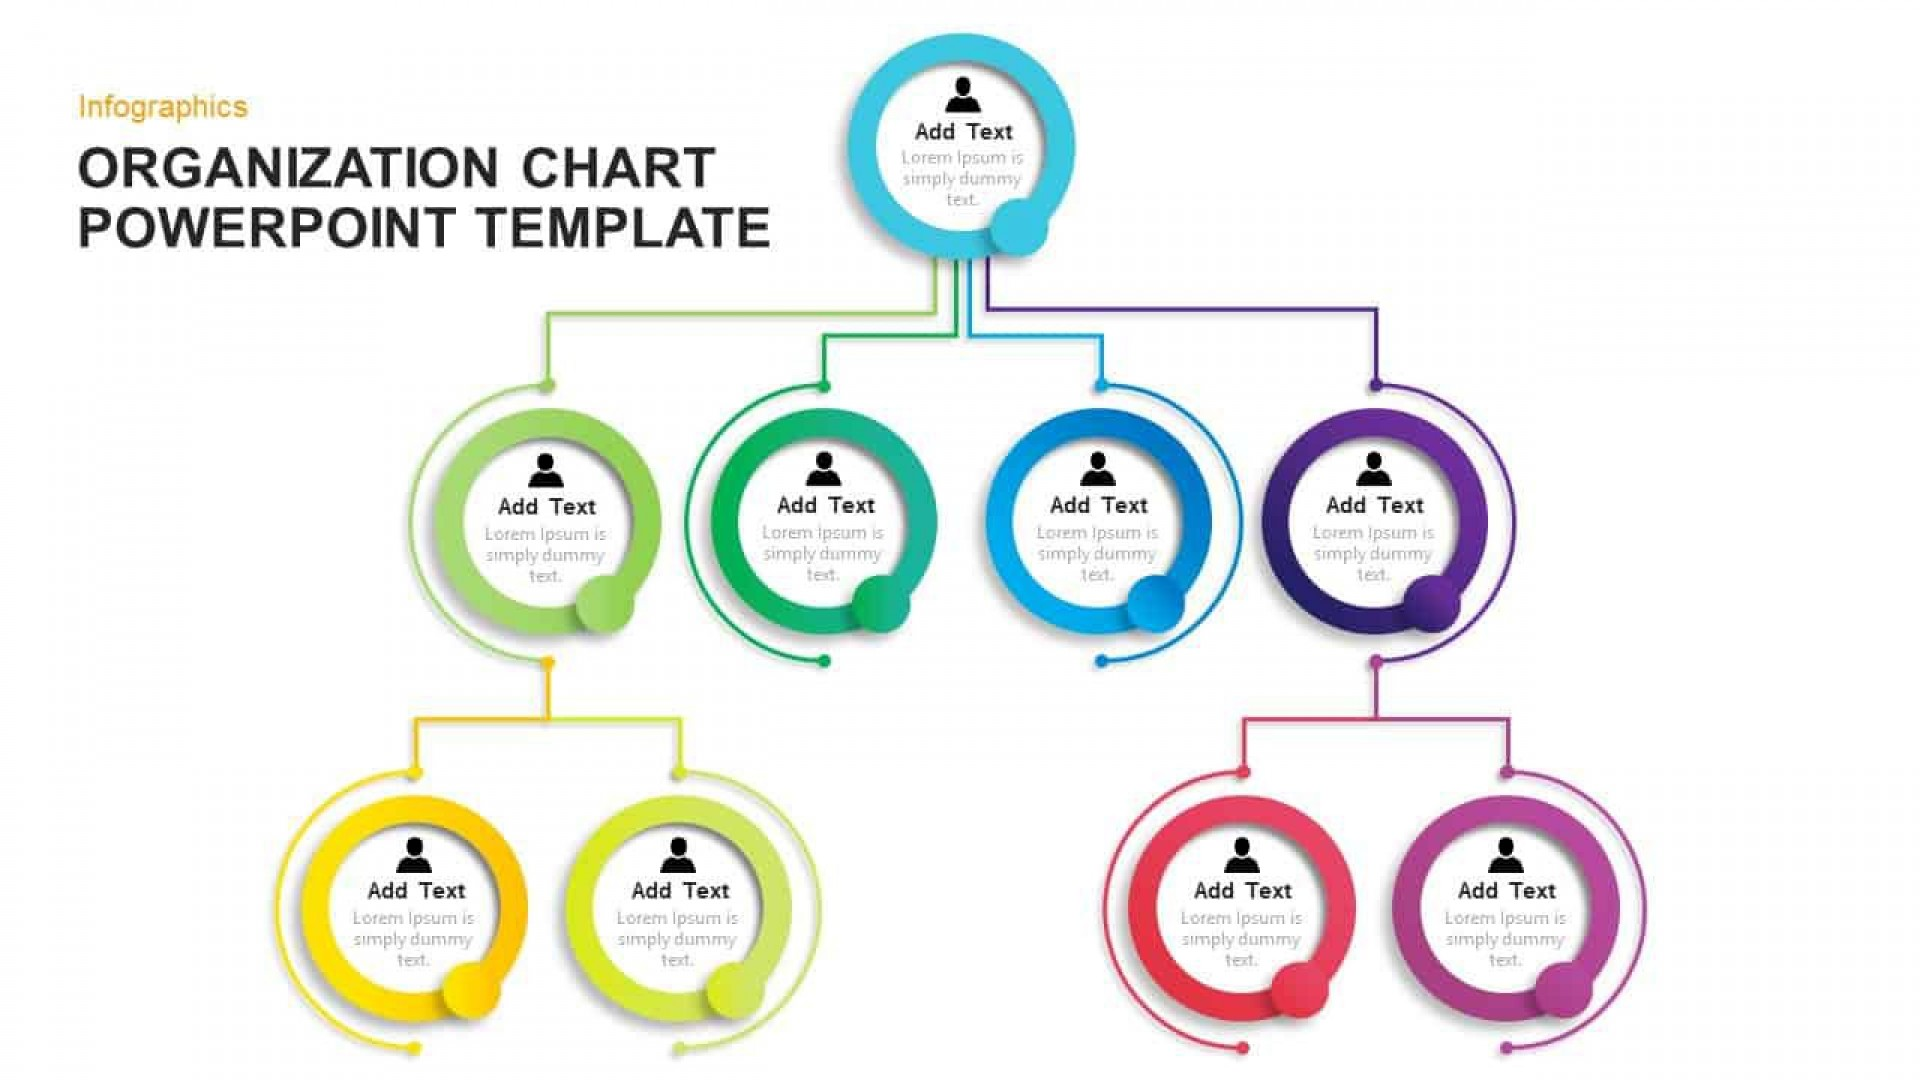 009 Striking Organizational Chart Template Powerpoint Free Image  Download 2010 Organization1920